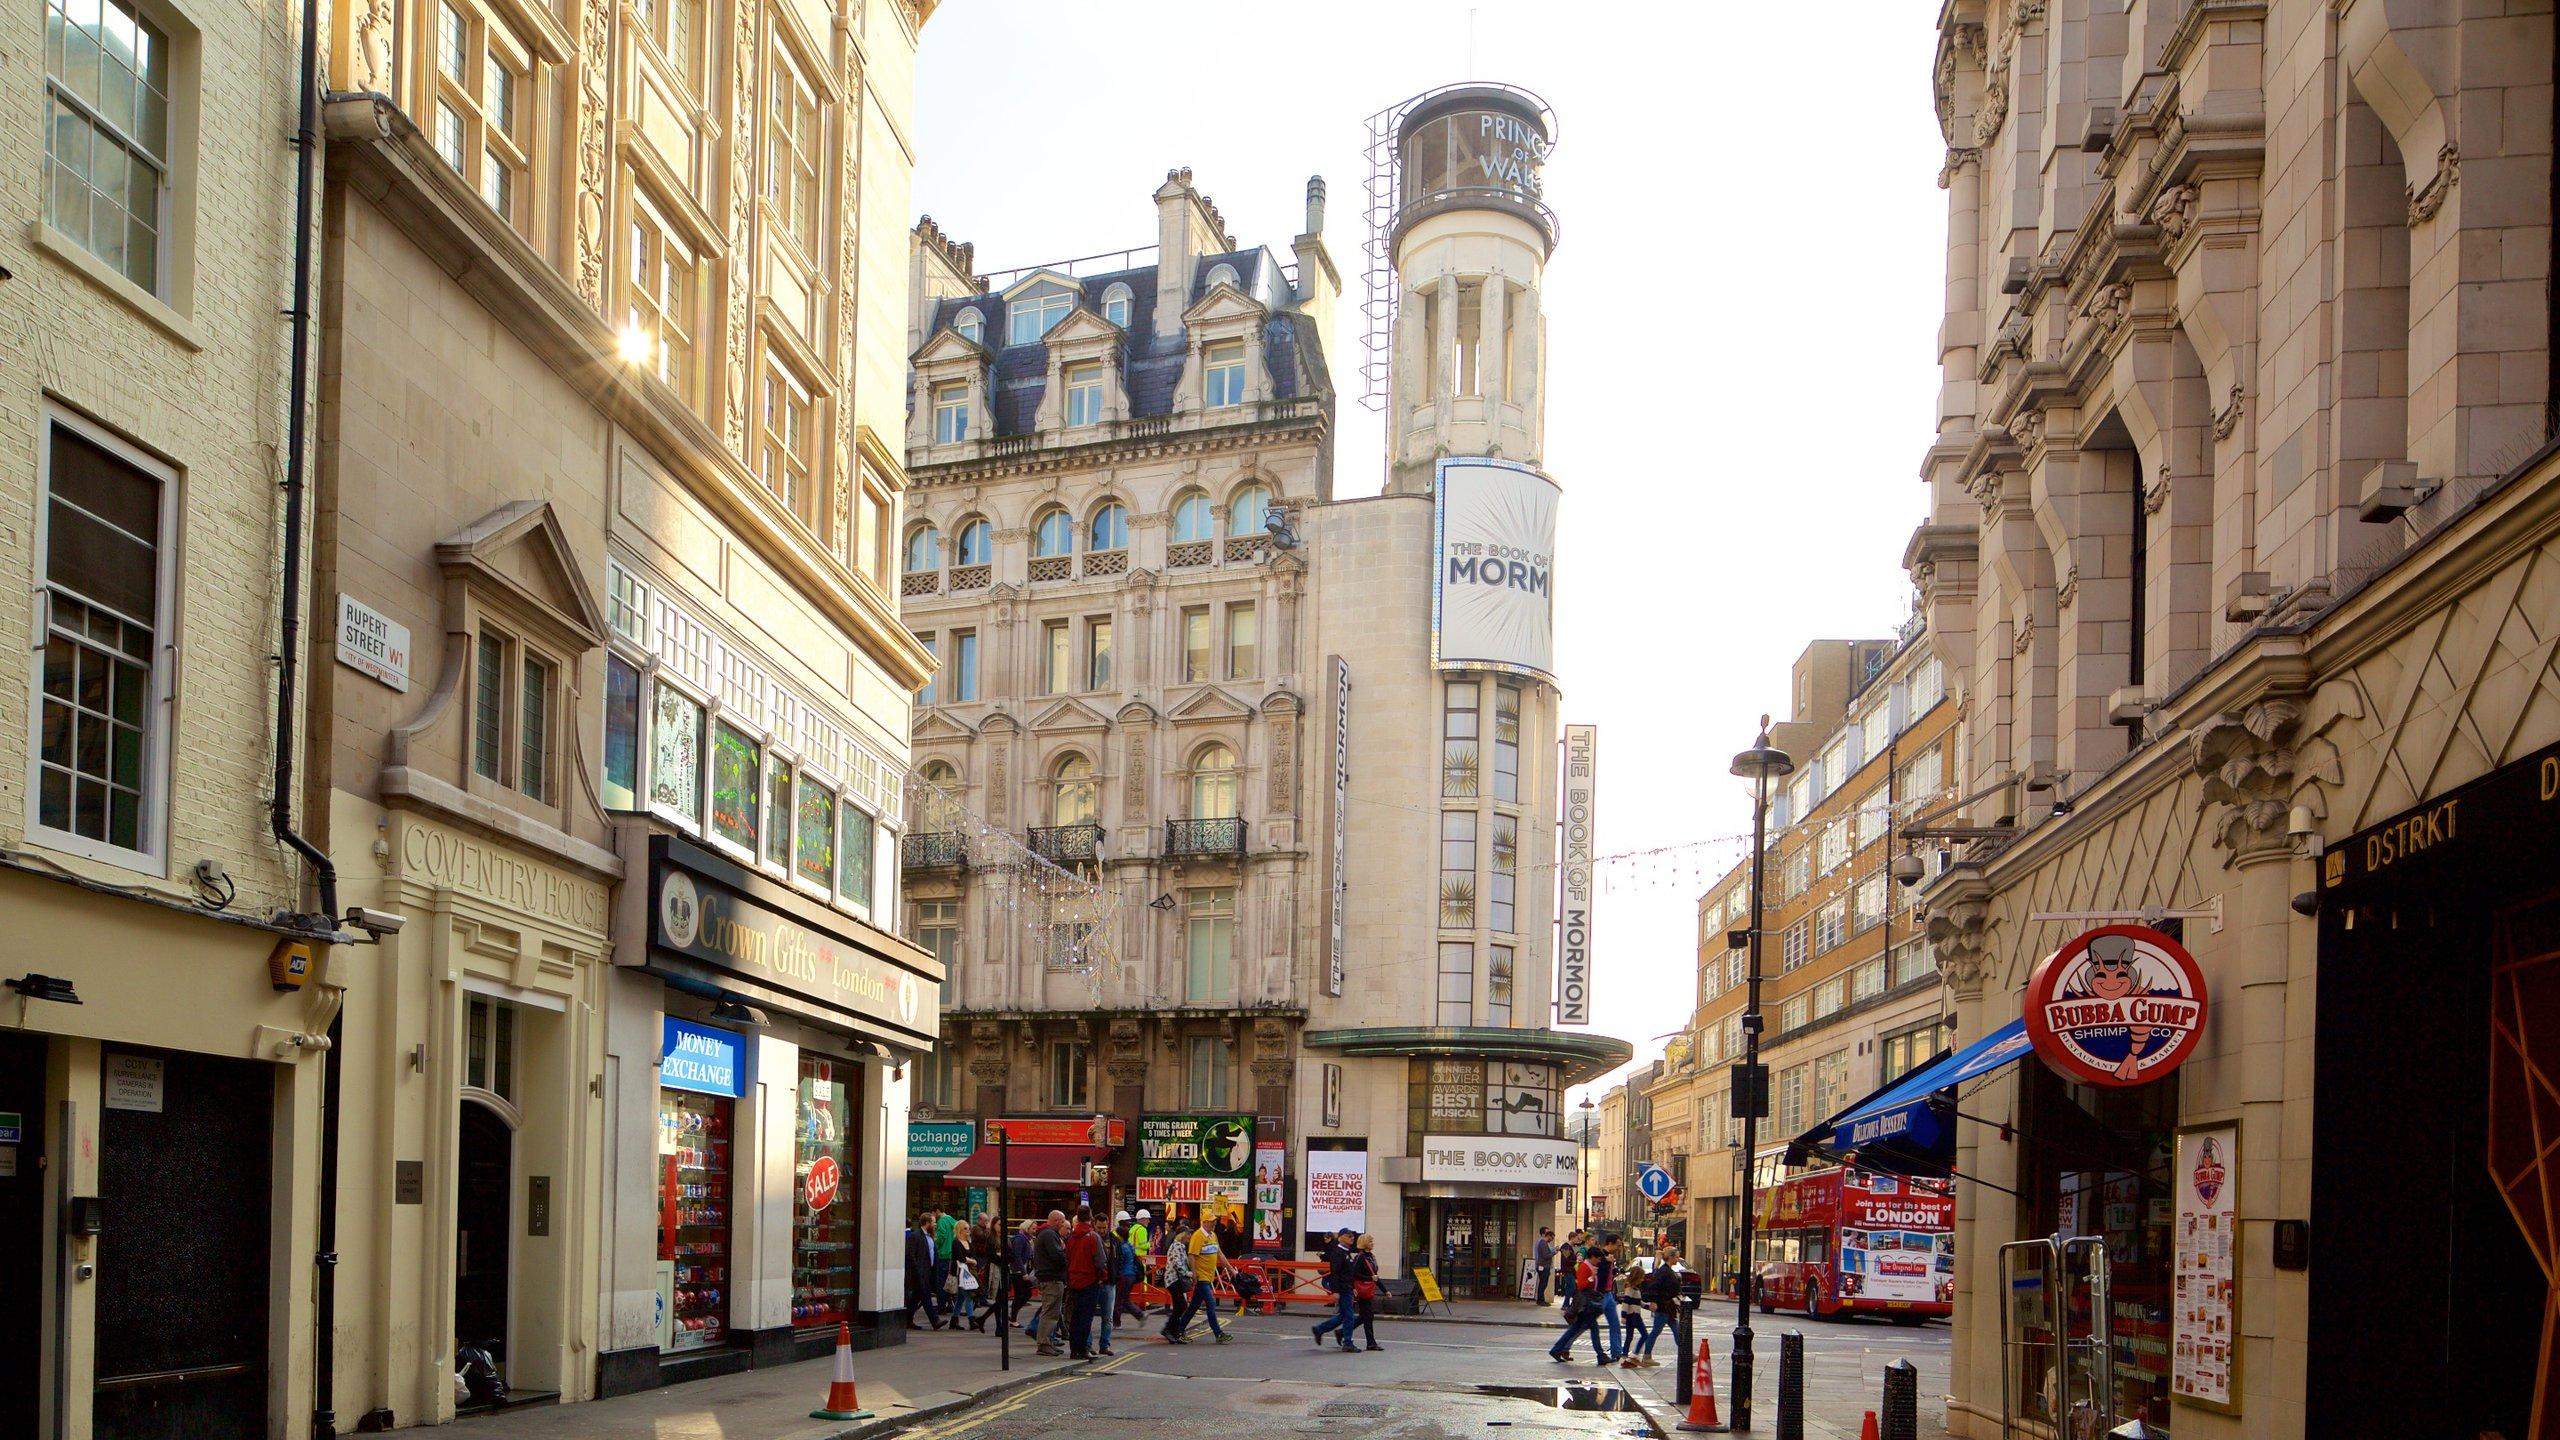 Prince of Wales Theatre, London, England, Großbritannien